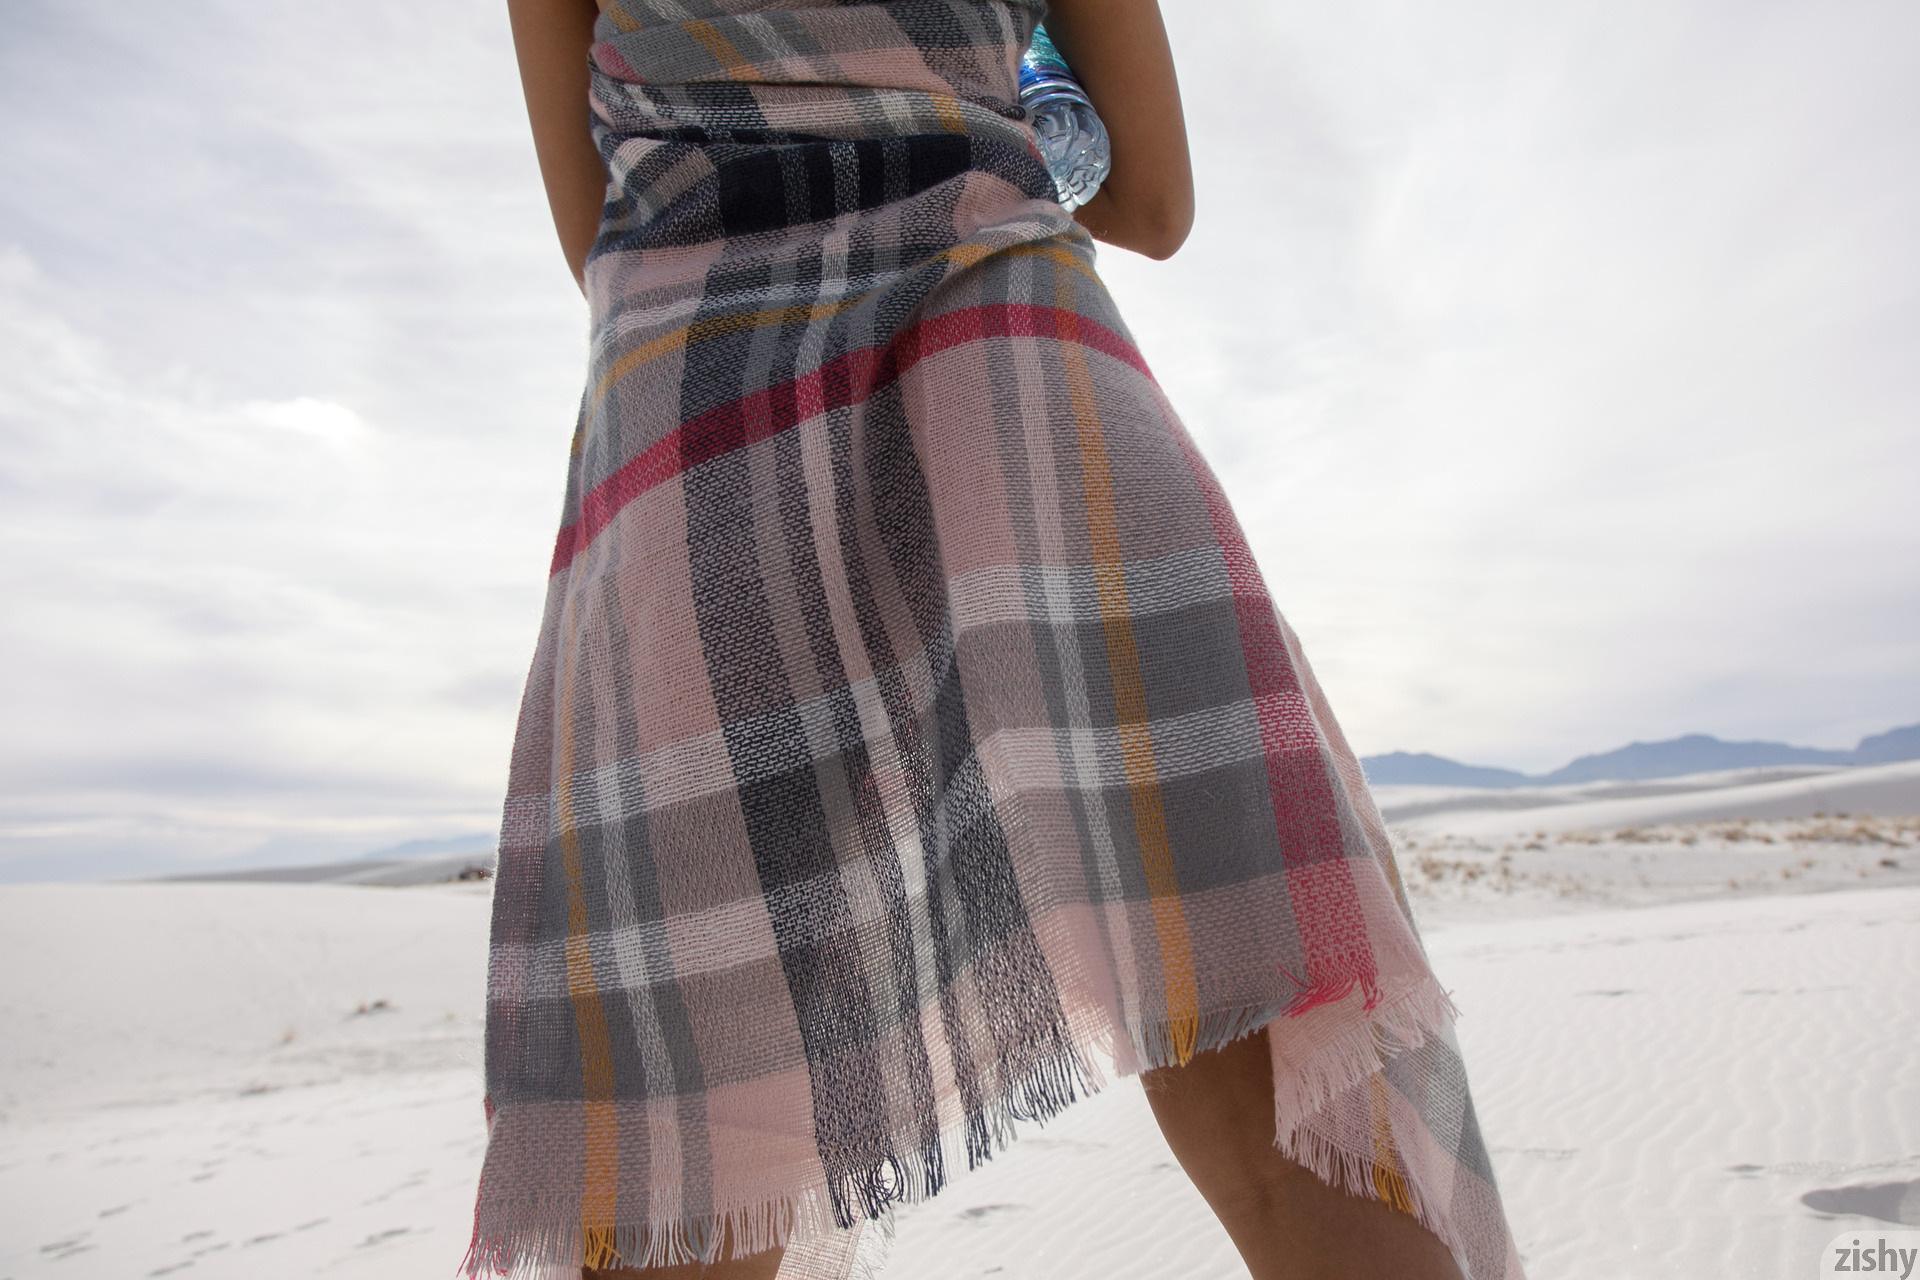 Alejandra Cobos White Sands 3 Zishy (32)